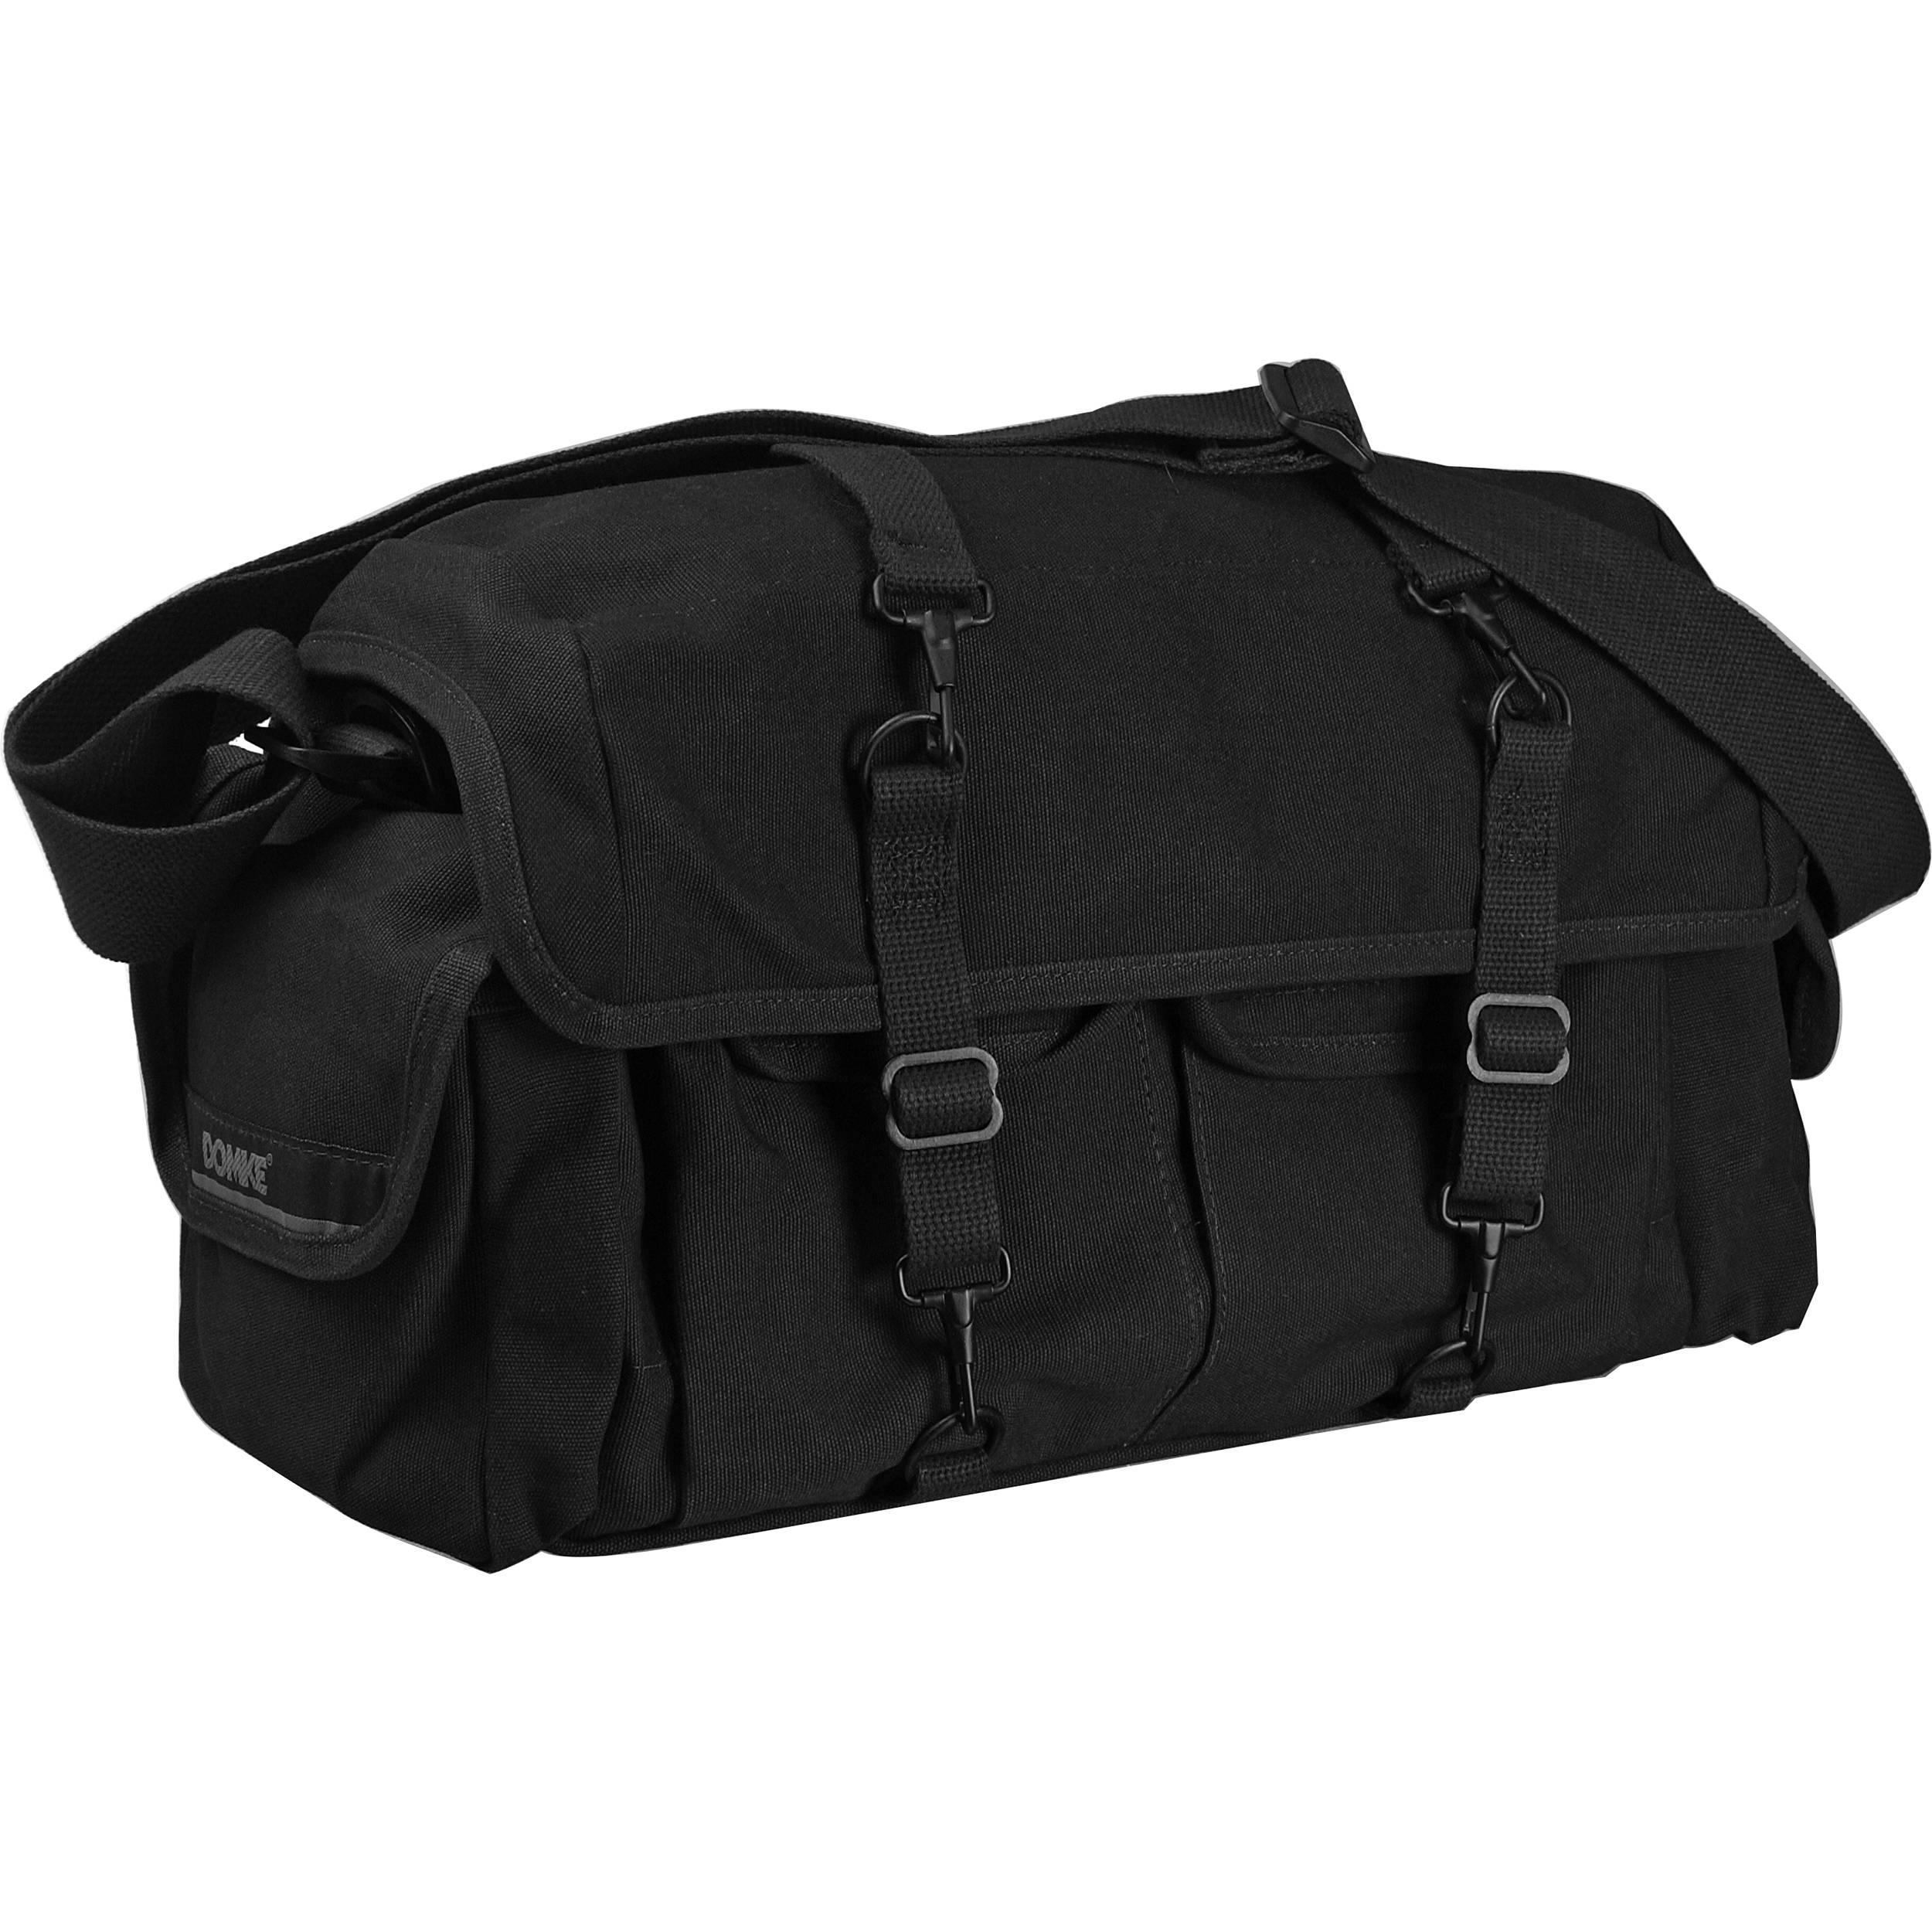 Domke F-1X Little Bit Bigger Classic Series Shoulder Bag (Black) ce8b8f016d6